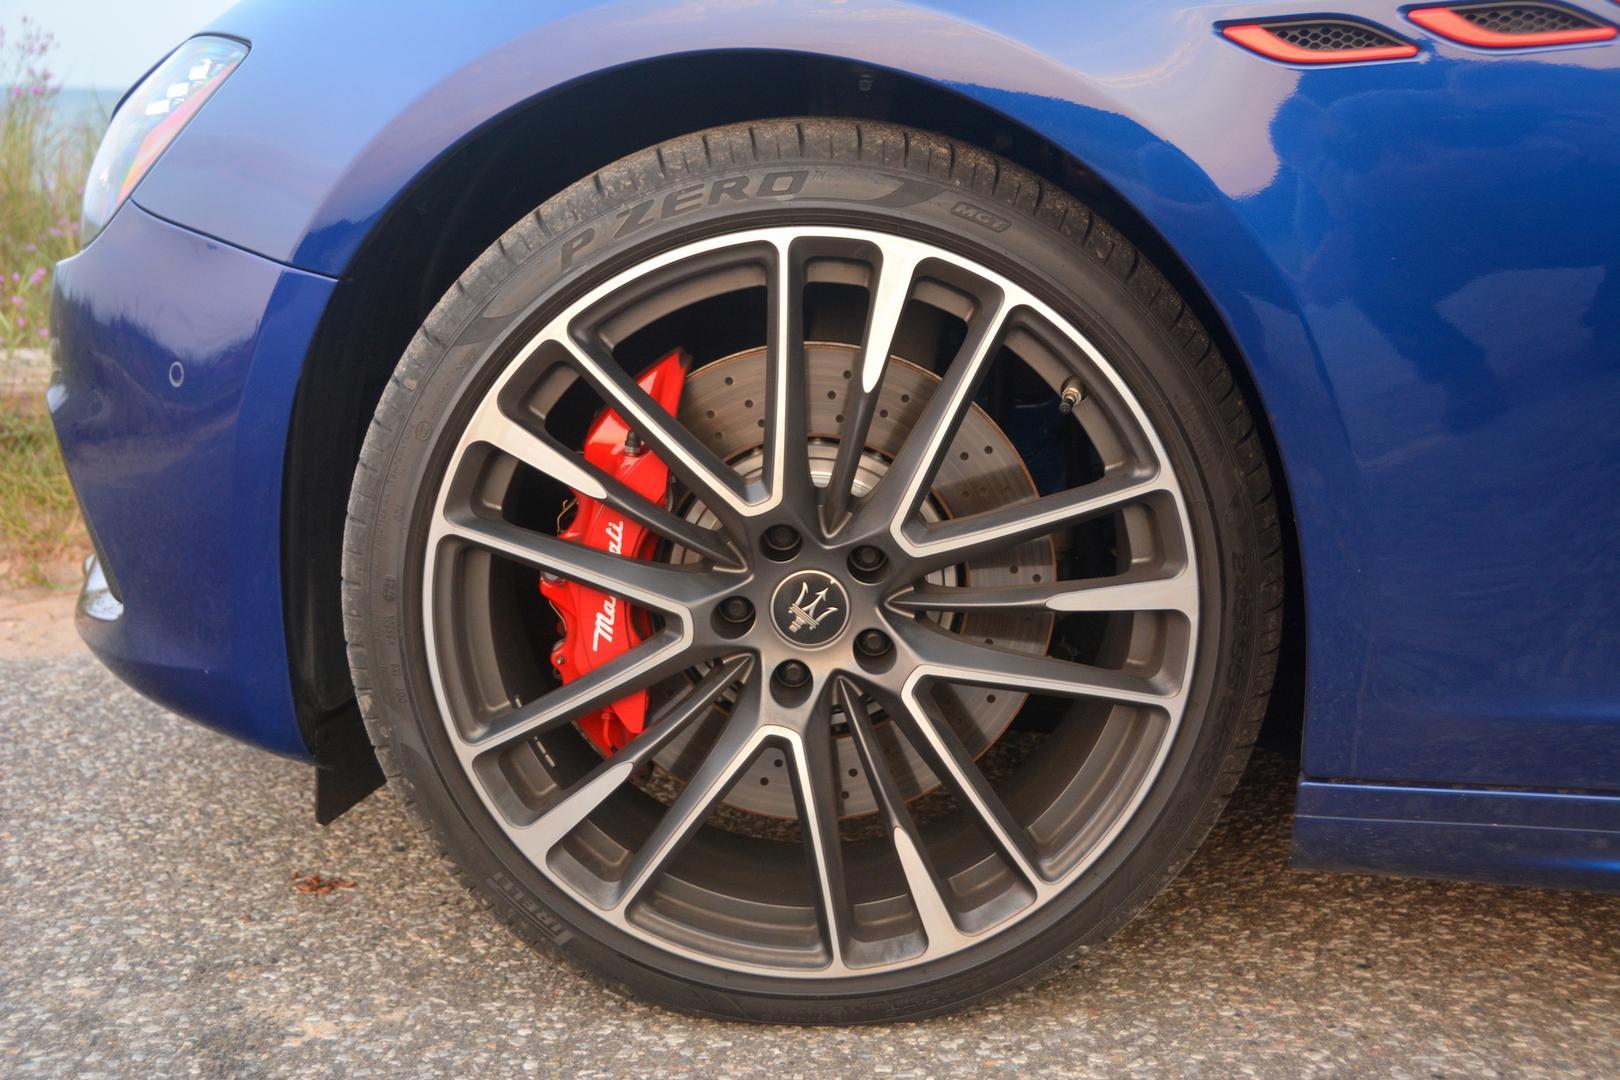 Maserati Ghibli Trofeo wheels